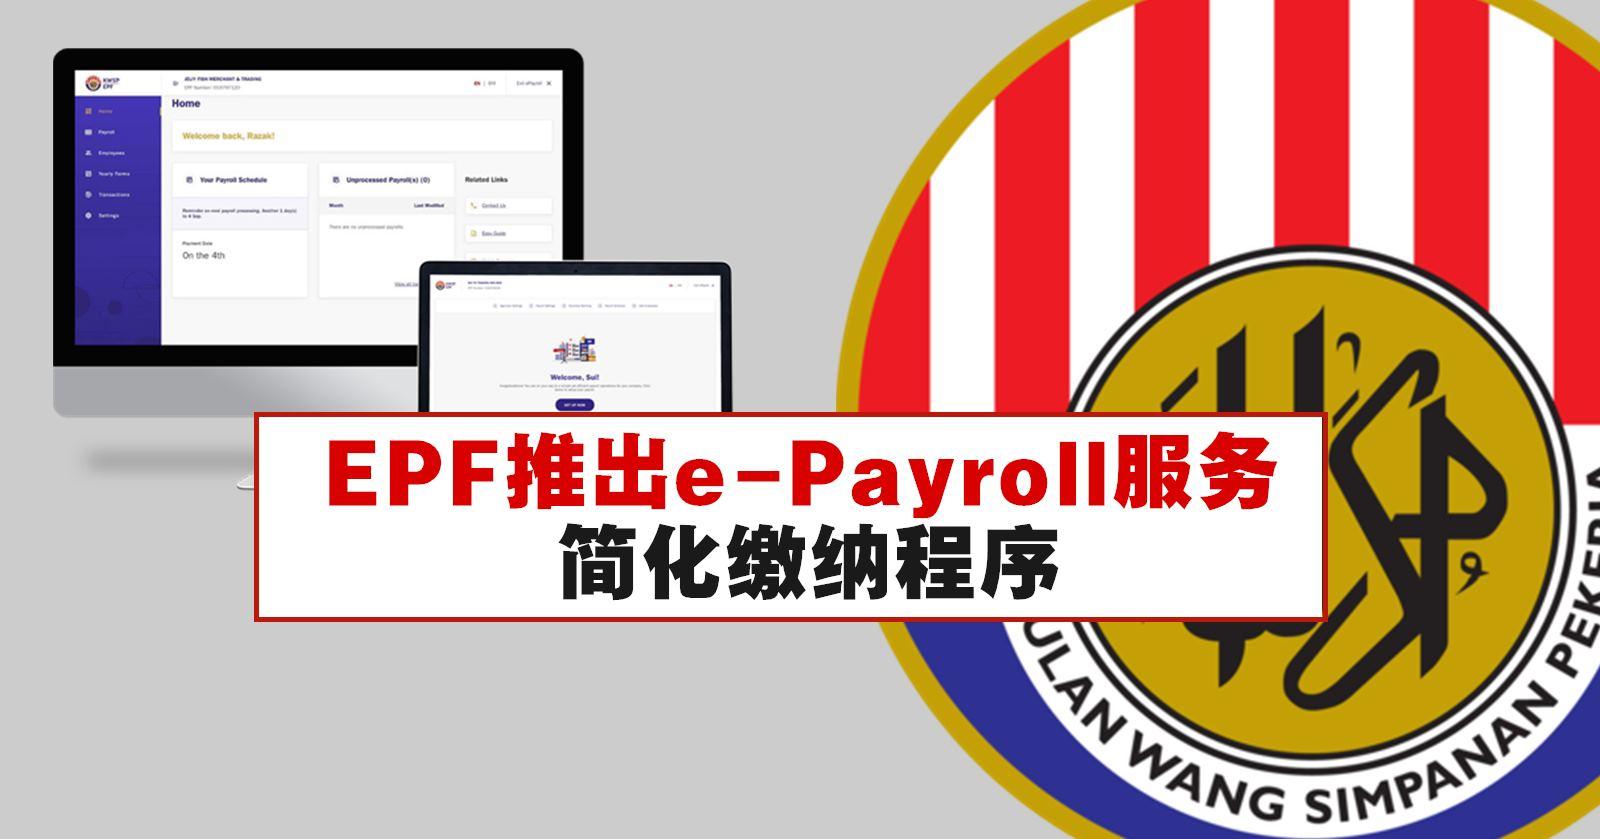 EPF推出e-Payroll服务,帮助雇主降低运营成本